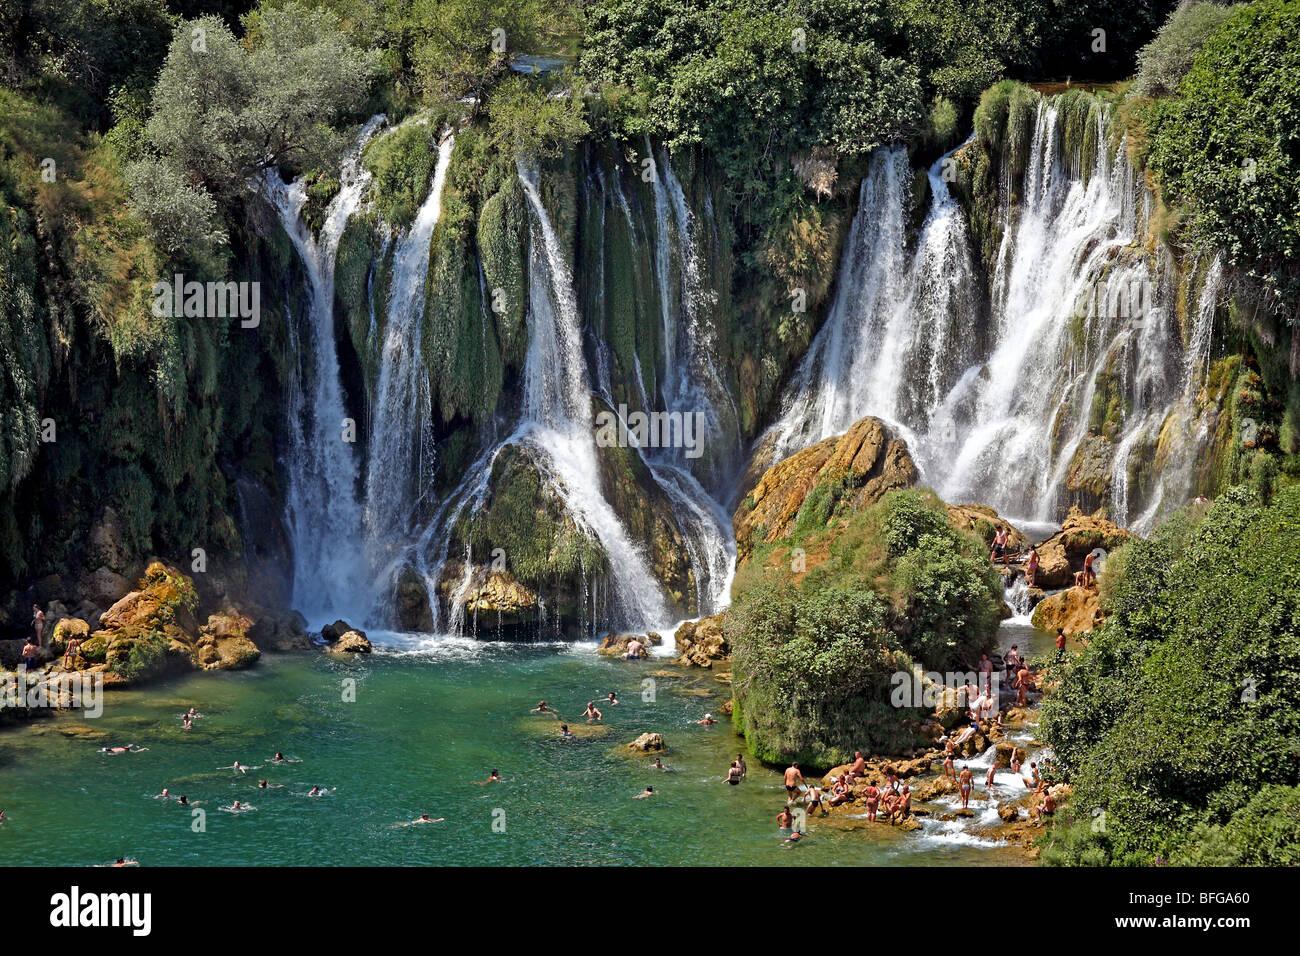 Bosnia and Herzegovina, Herzegovina Ljubuski district. Kravica Waterfalls on the Trebizat River with visiting tourists. - Stock Image